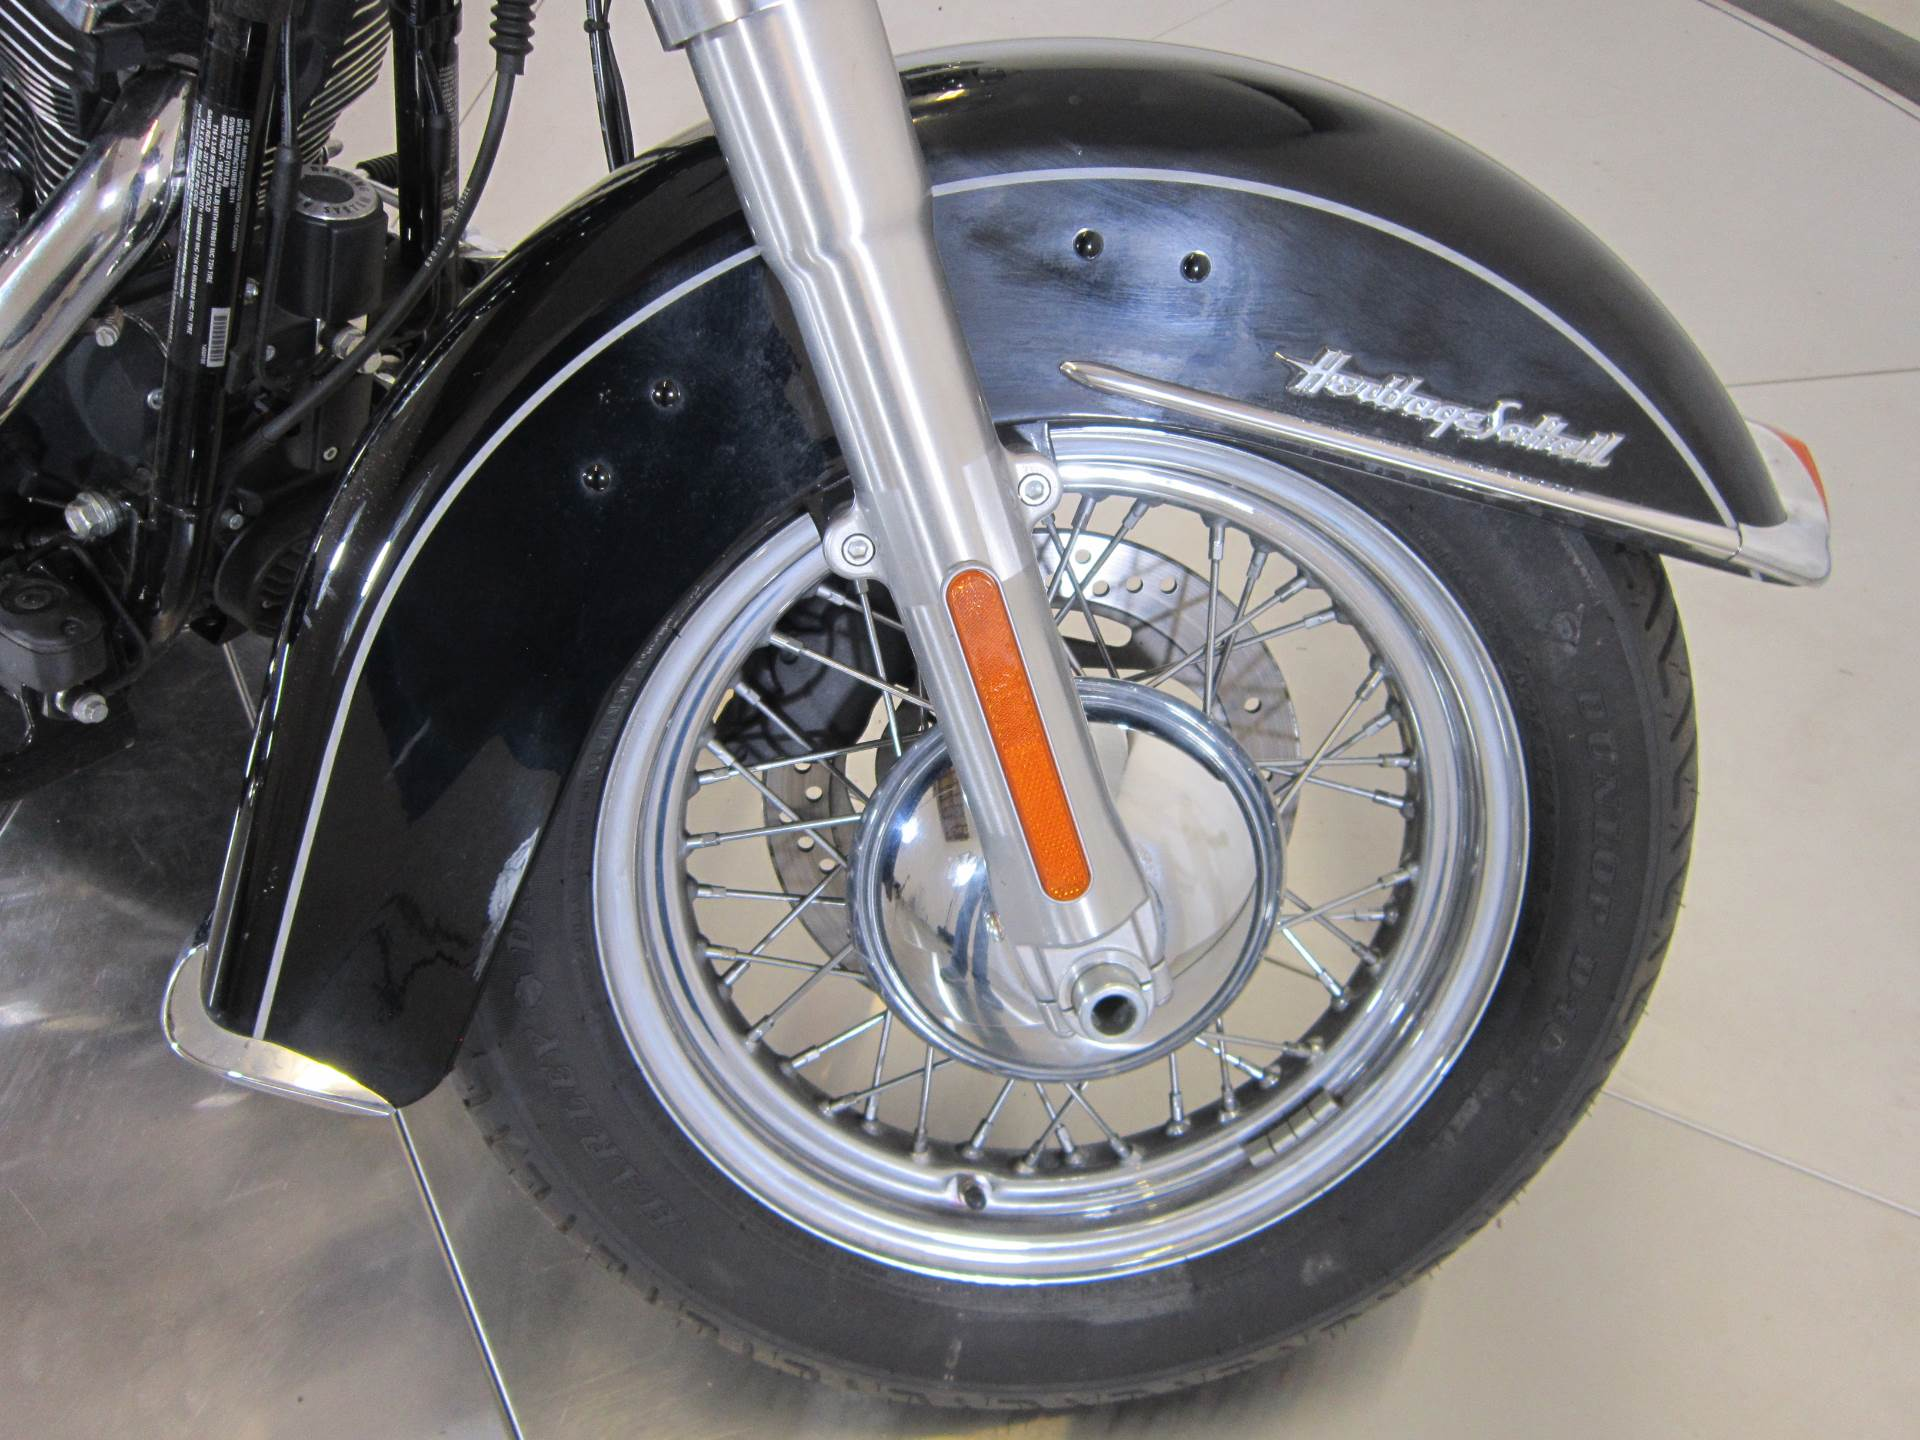 2011 Harley-Davidson Heritage Softail® Classic in Greenwood Village, Colorado